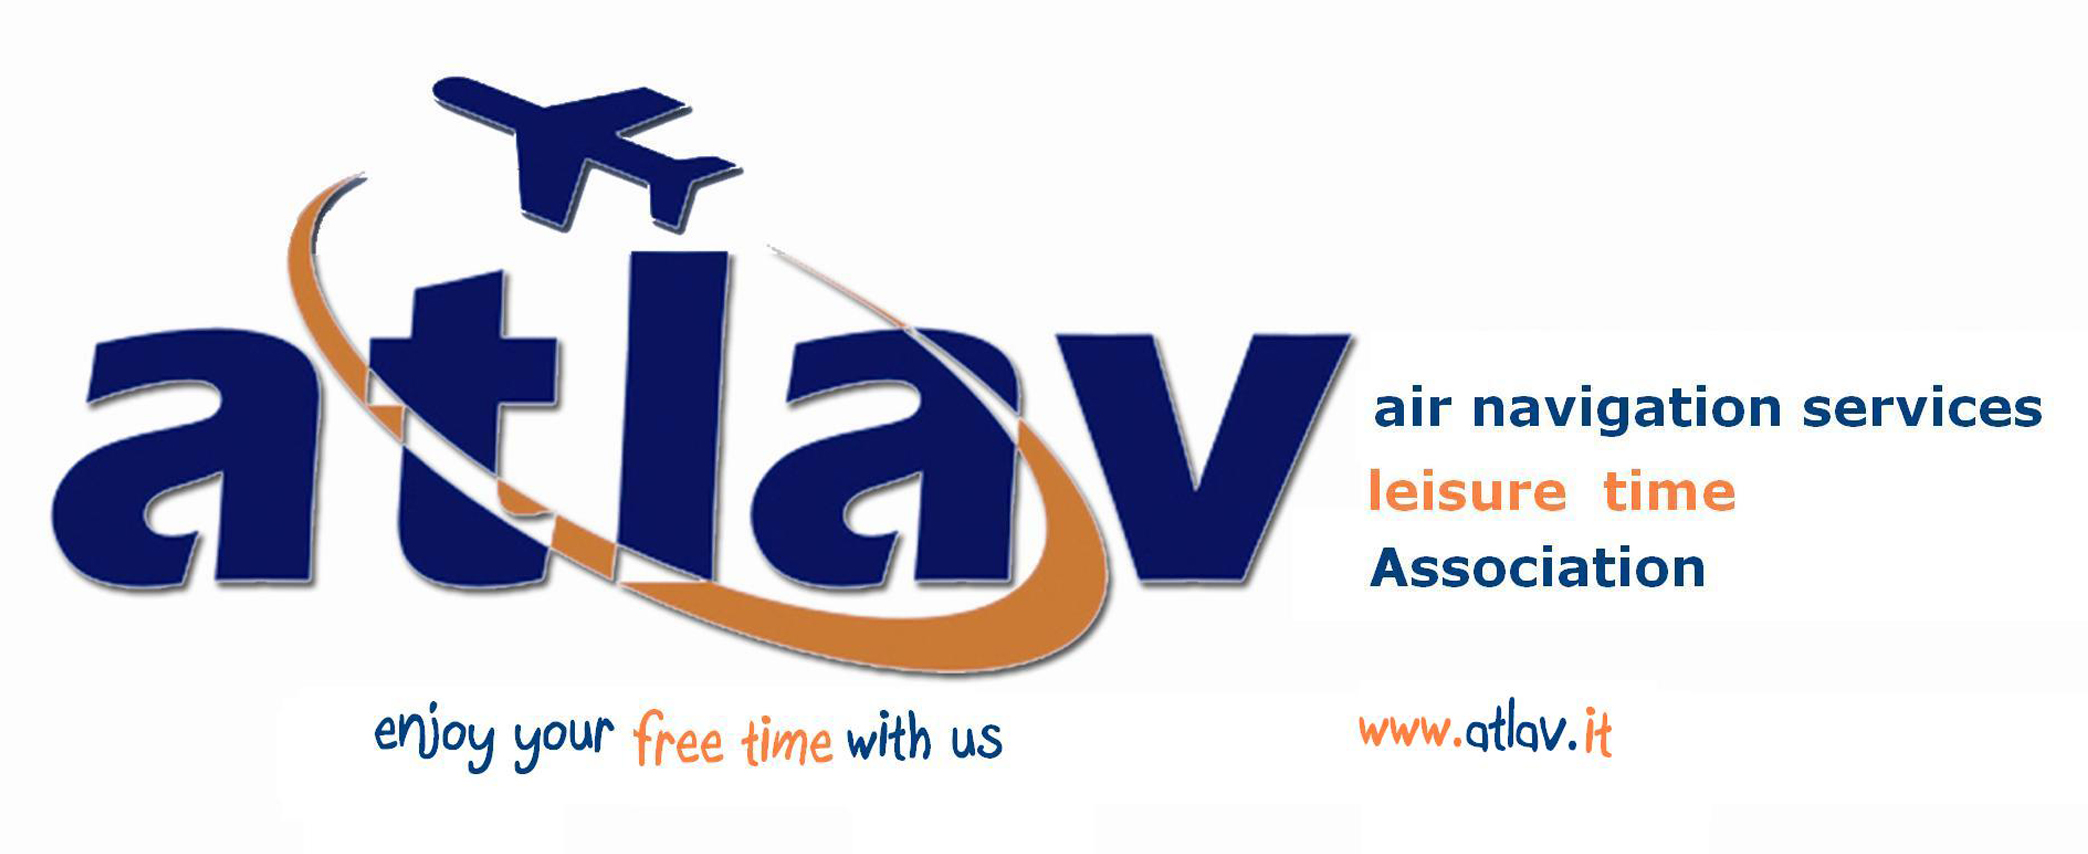 logo-atlav-with-claim